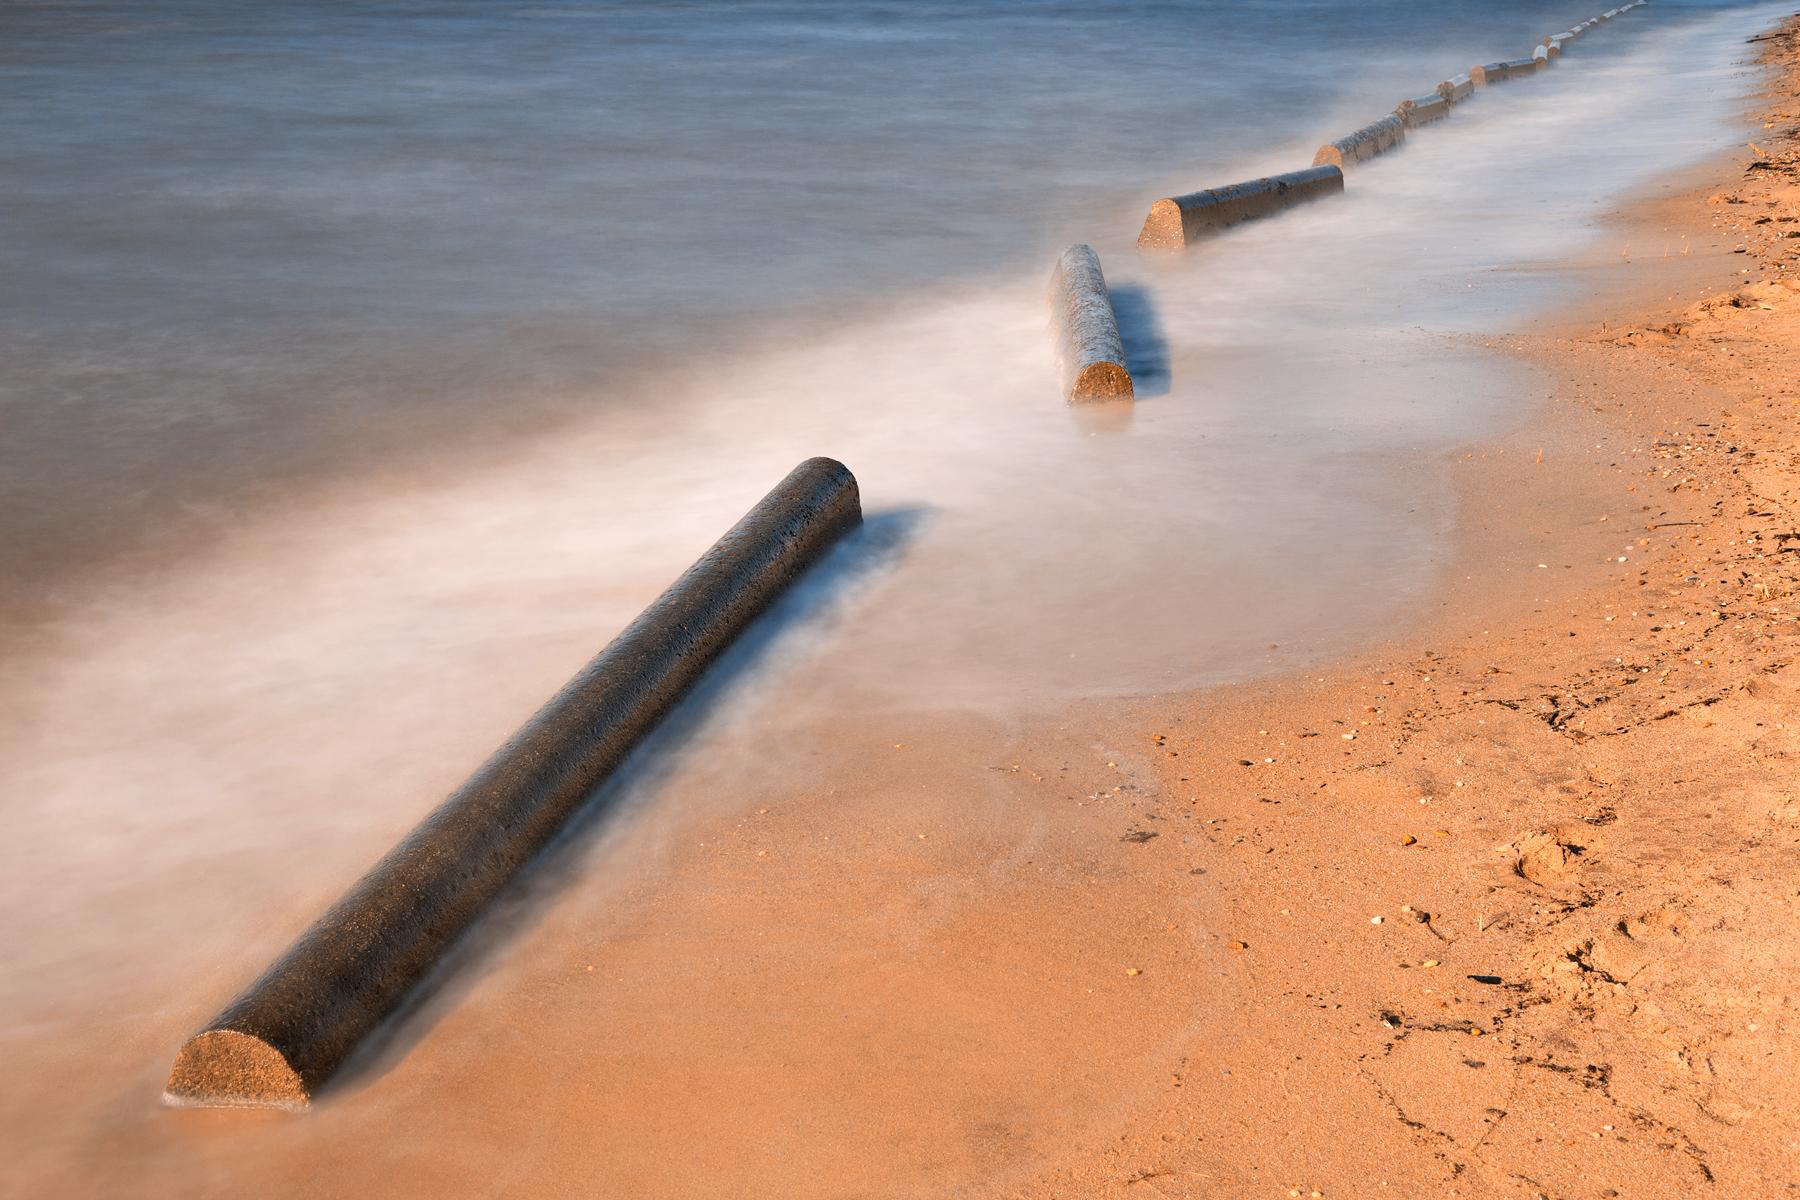 Concrete Beach Front, America, Scenery, Simplistic, Simple, HQ Photo